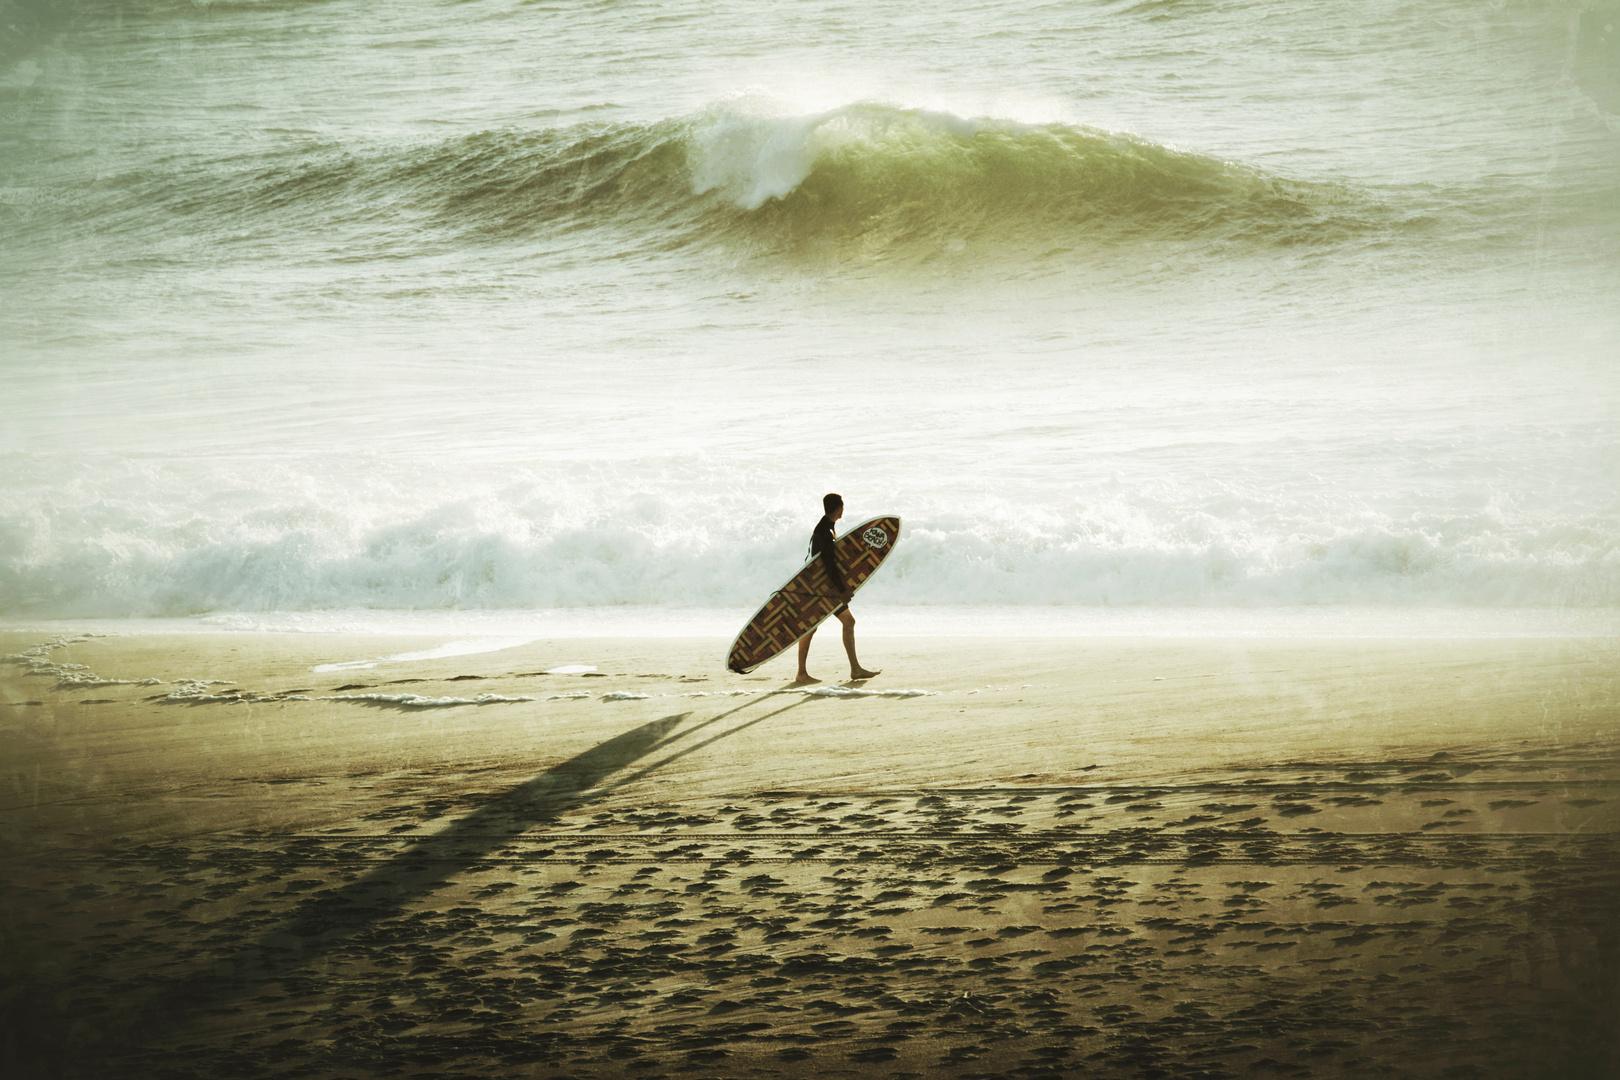 Surfer Teil 2